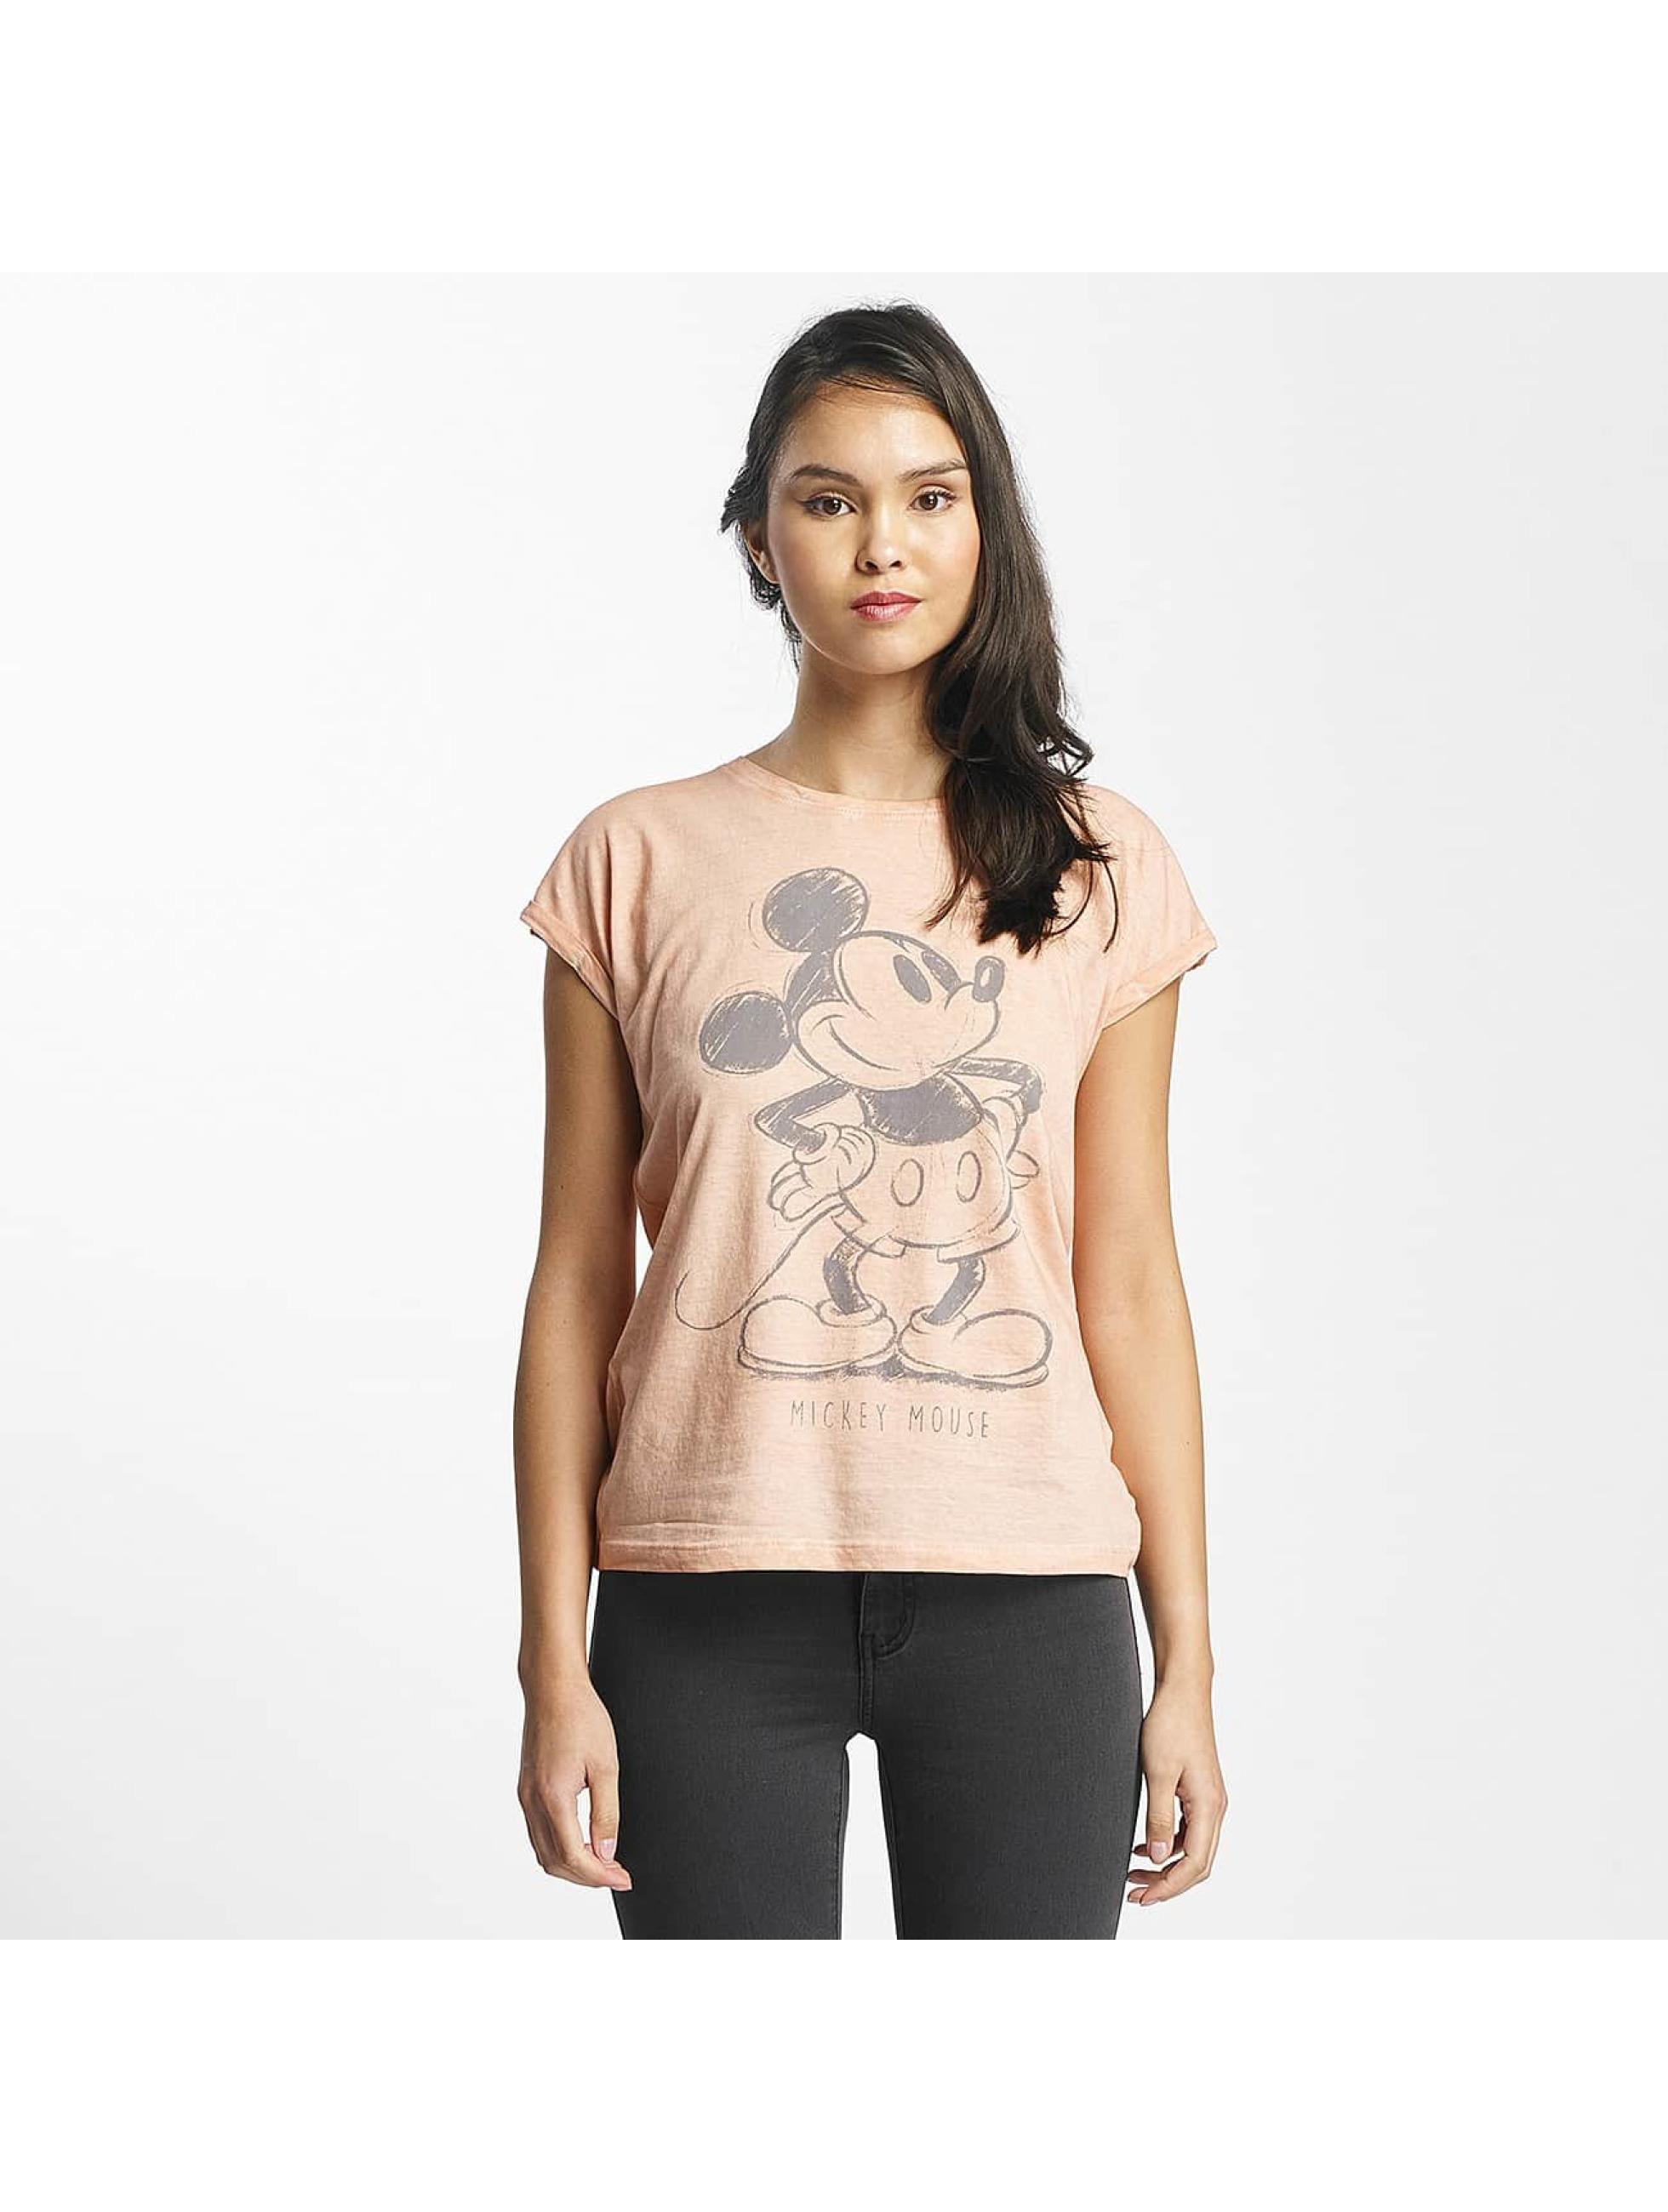 Rock Angel Frauen T-Shirt Mickey Mouse in rosa